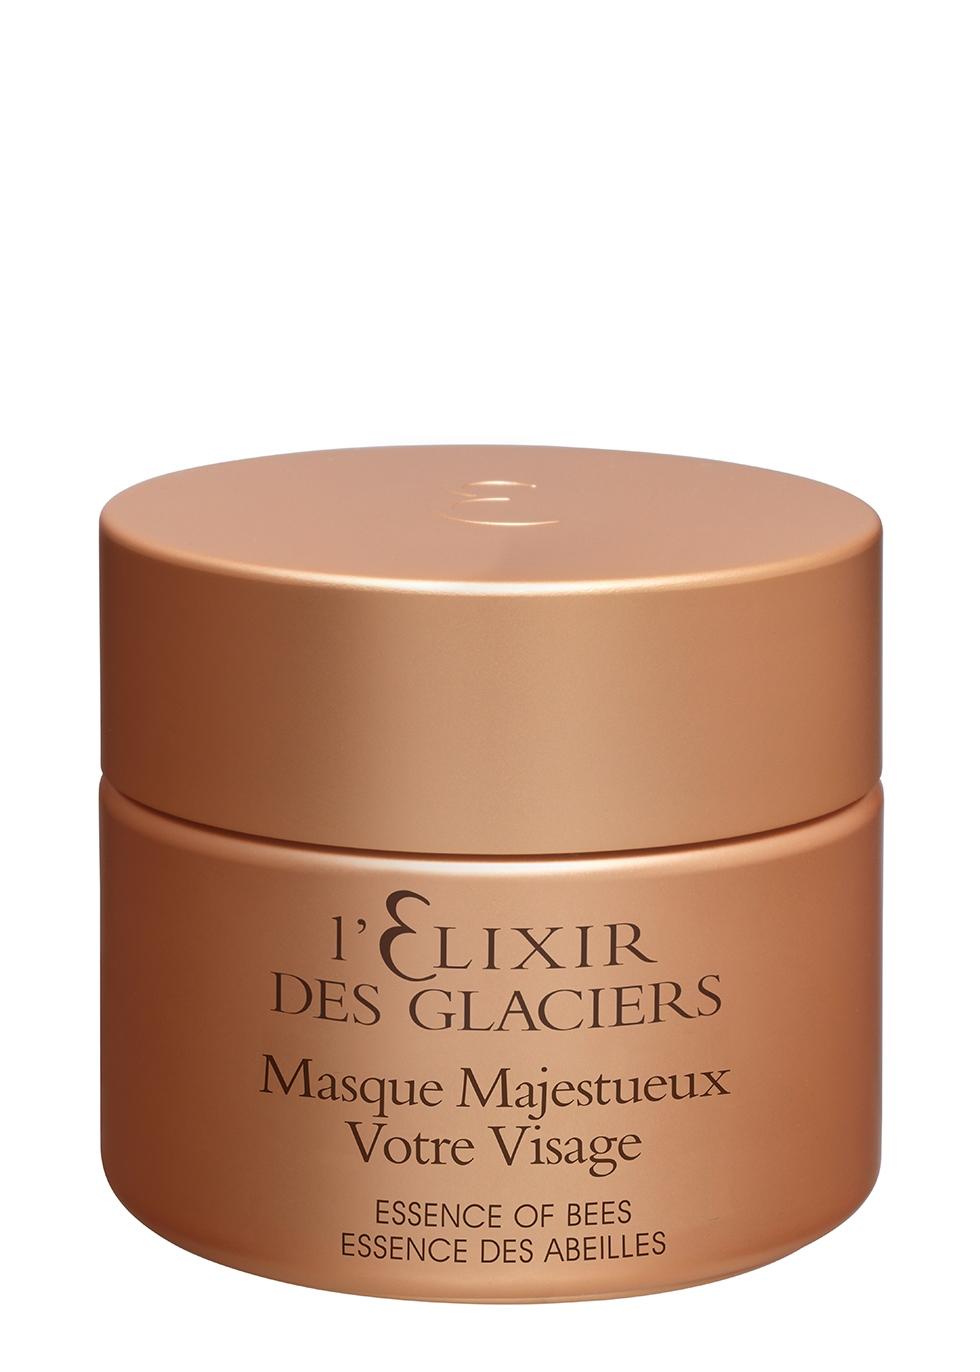 Masque Majestueux Votre Visage Universal Nourishing Massage Mask 50ml